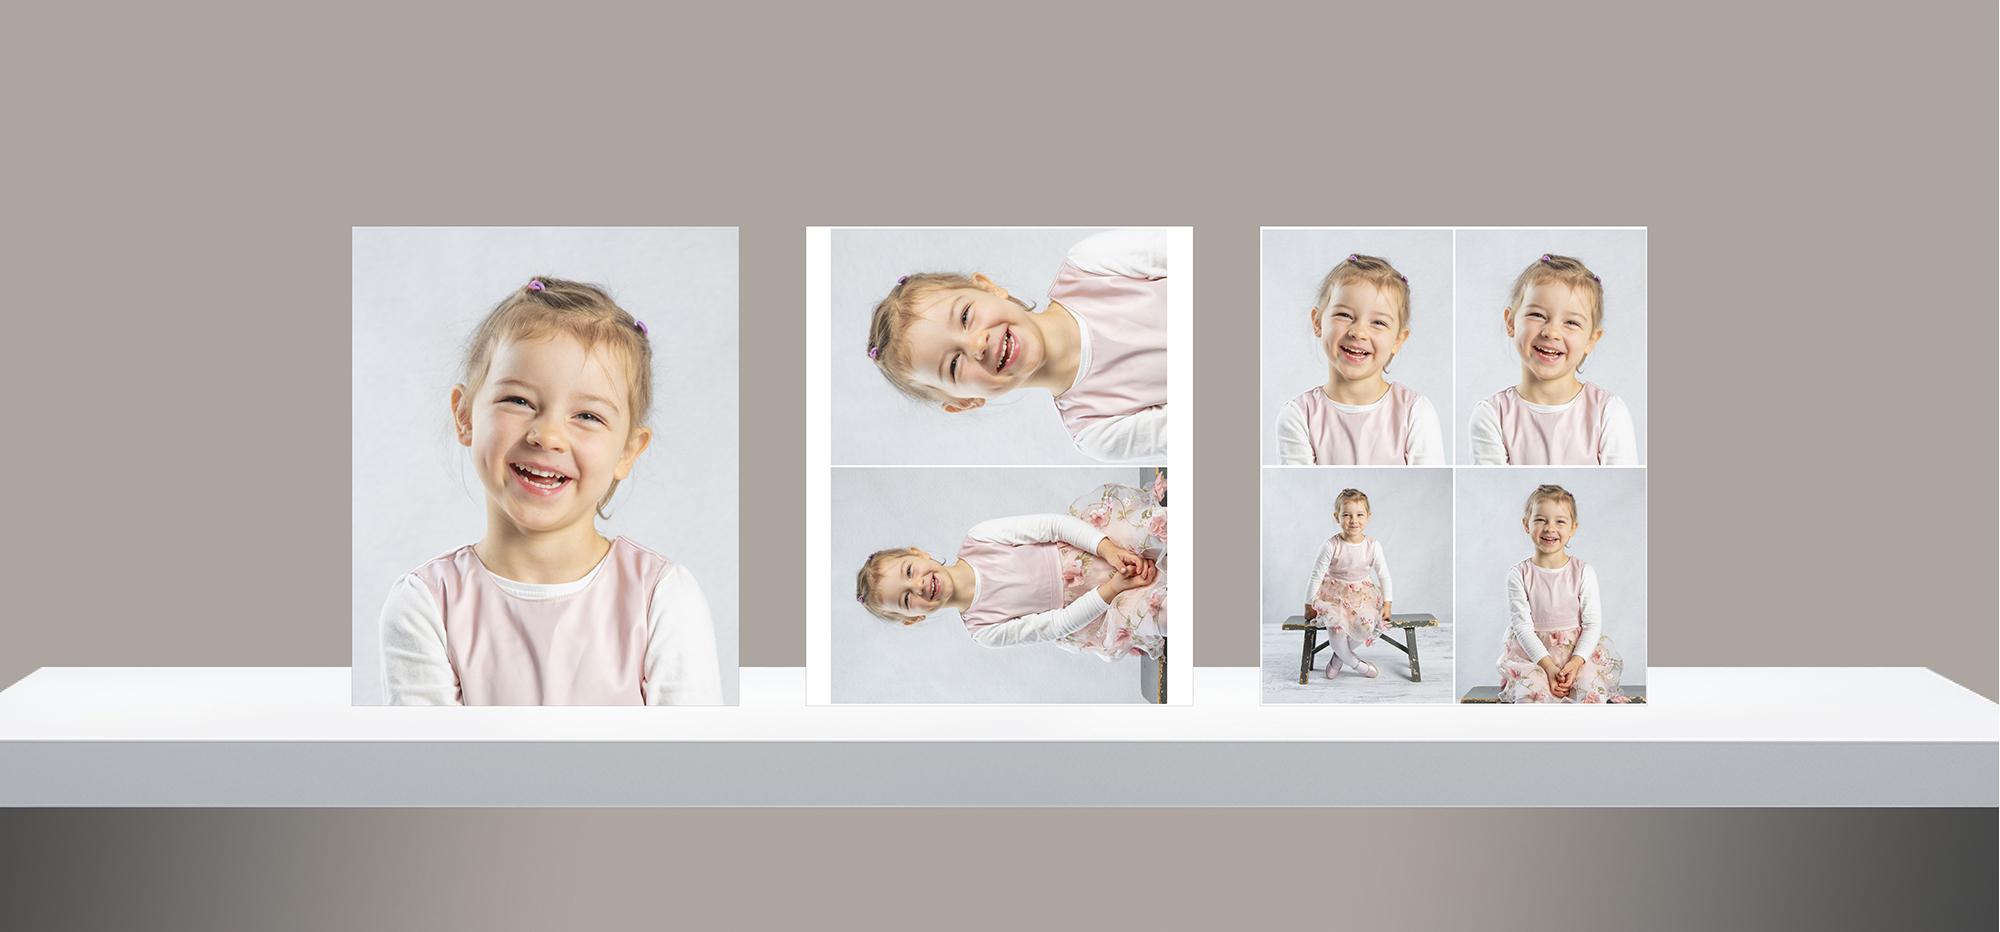 Liten portrettpakke barnehage